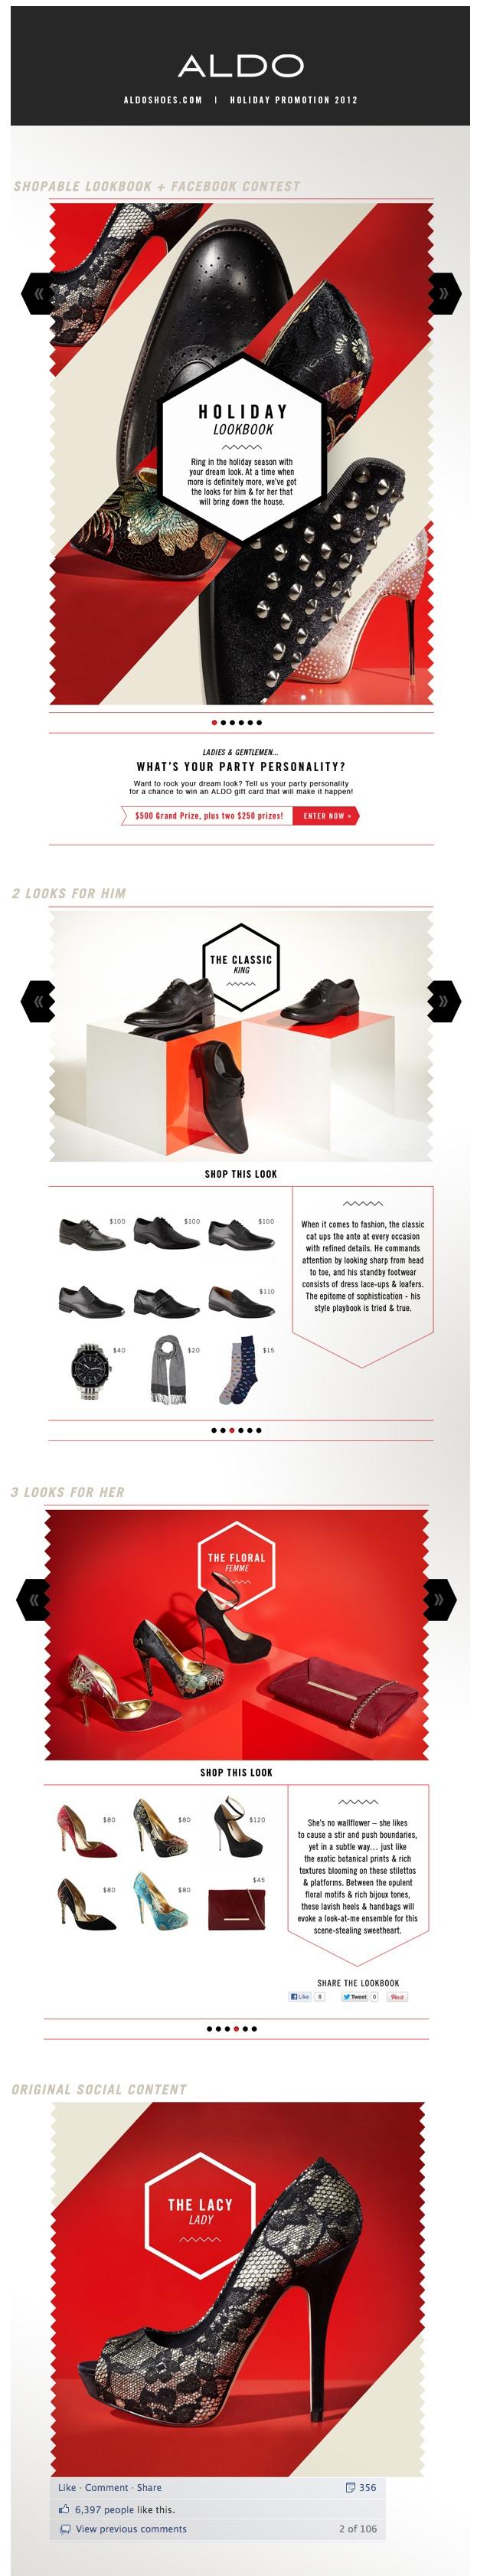 aldo shoes cleaner photoshop cs5